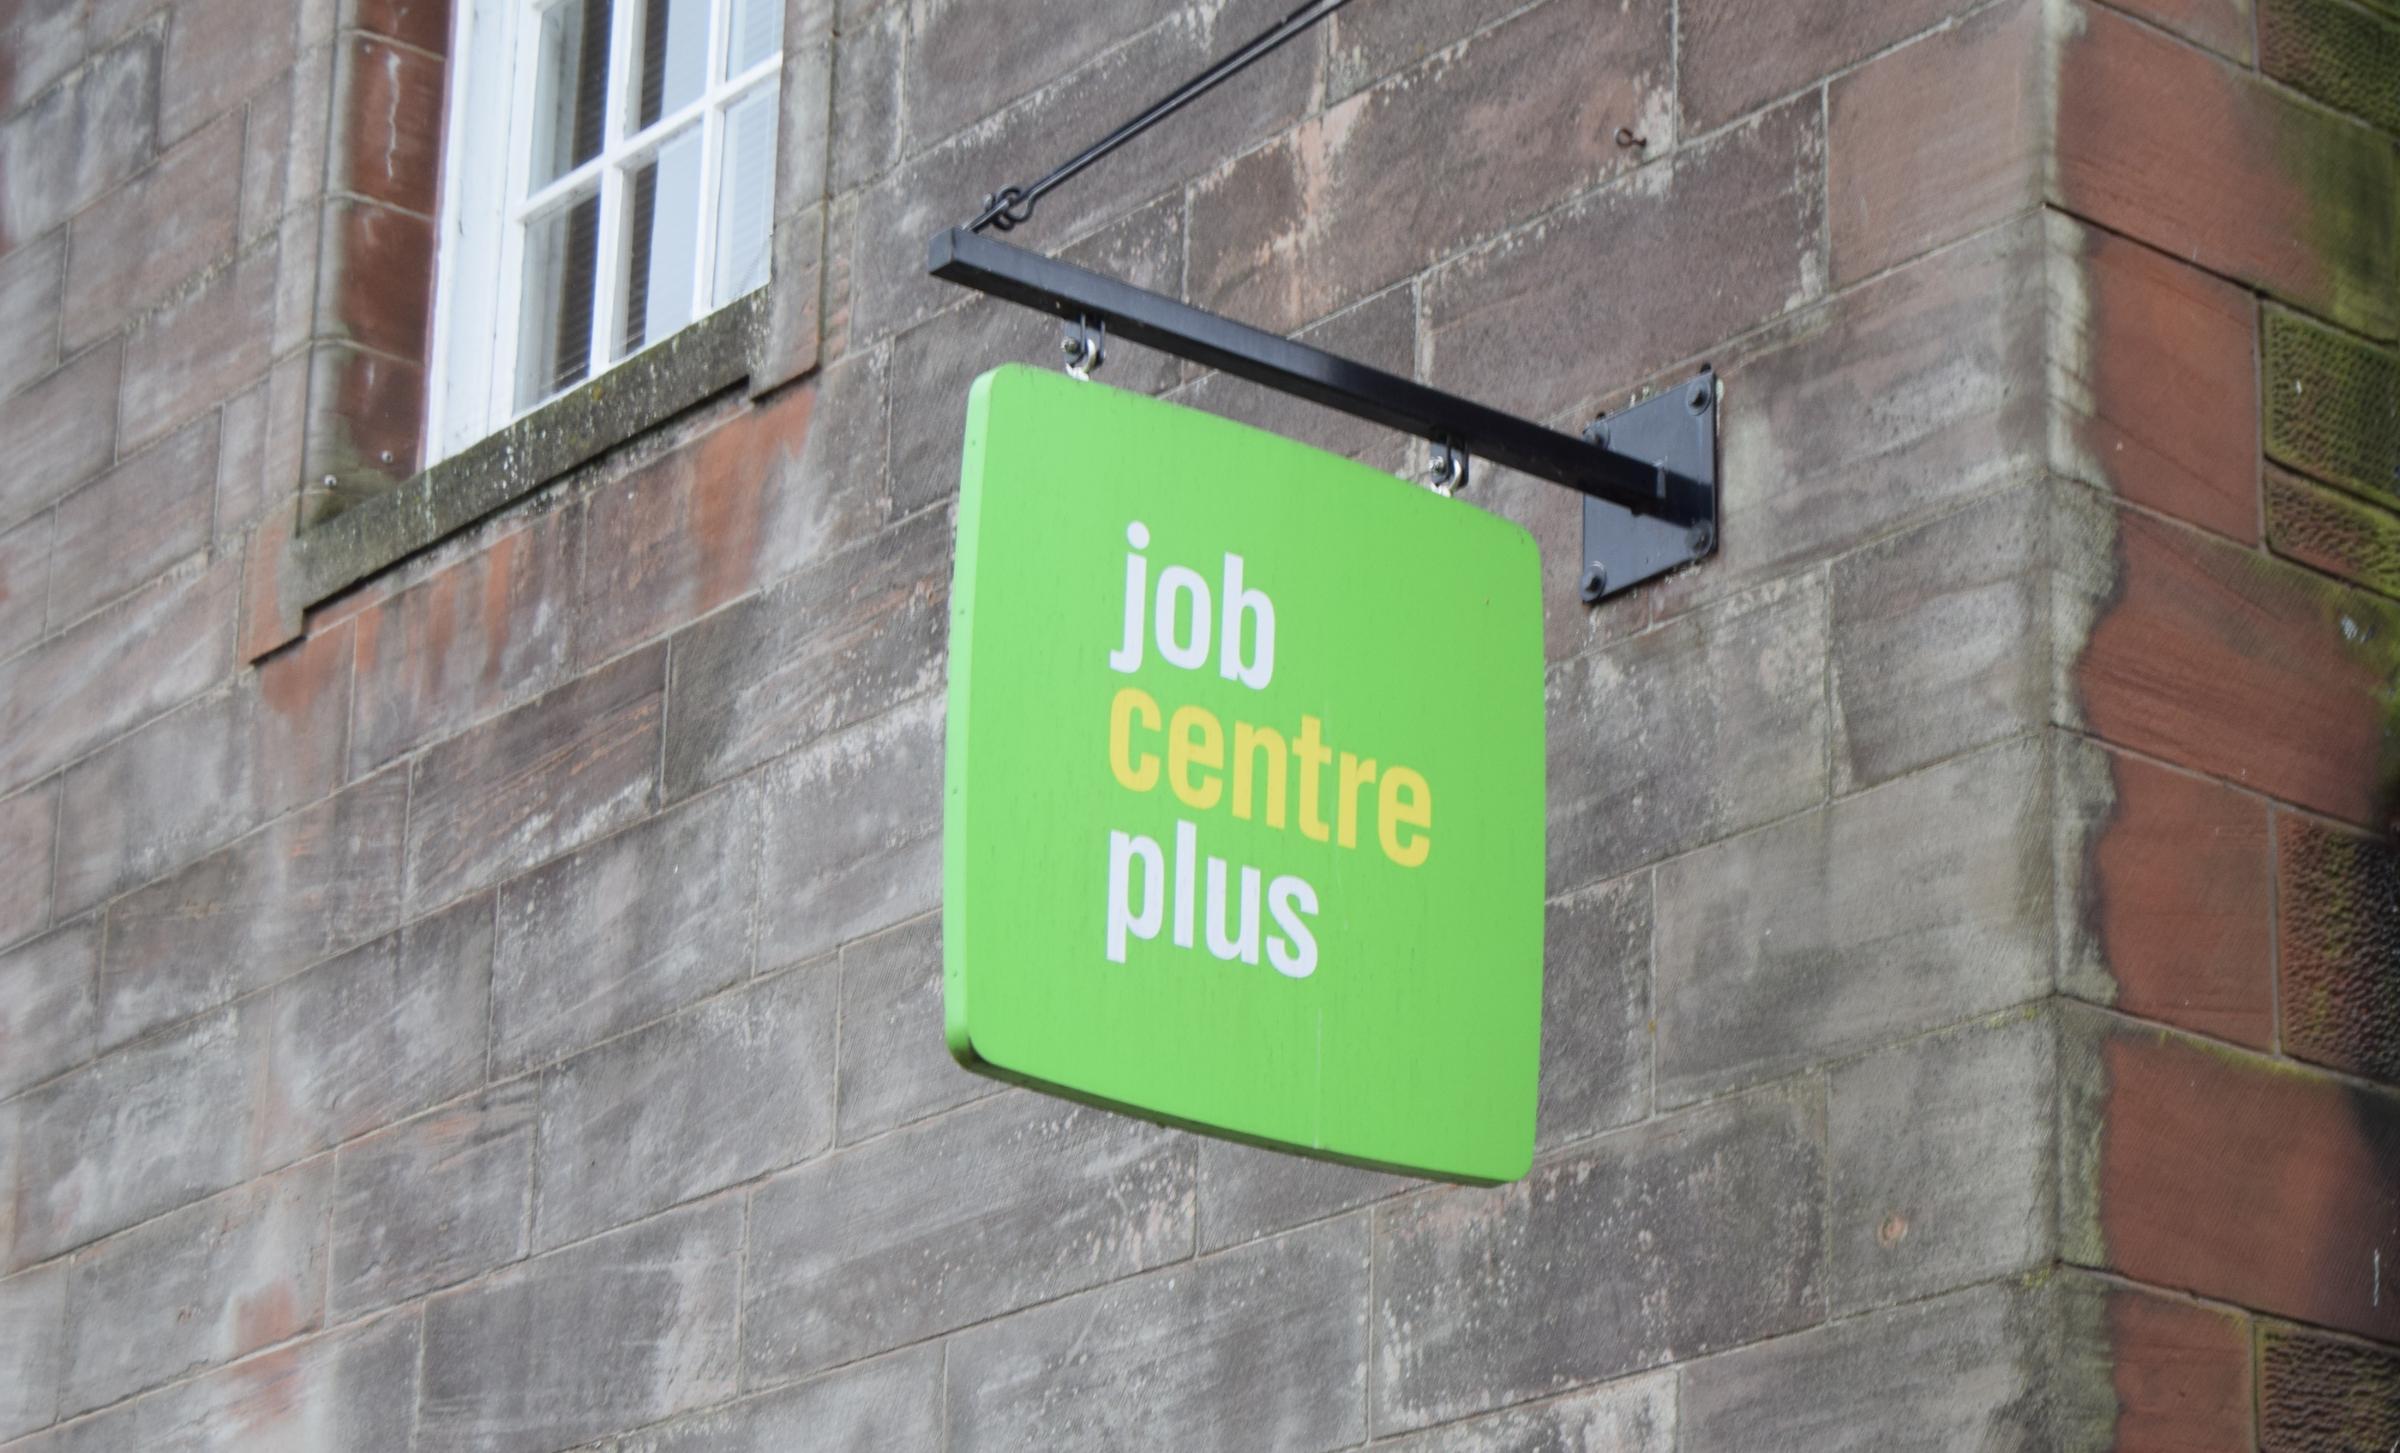 Jobcentre Plus in Alloa to host Jobs Fair